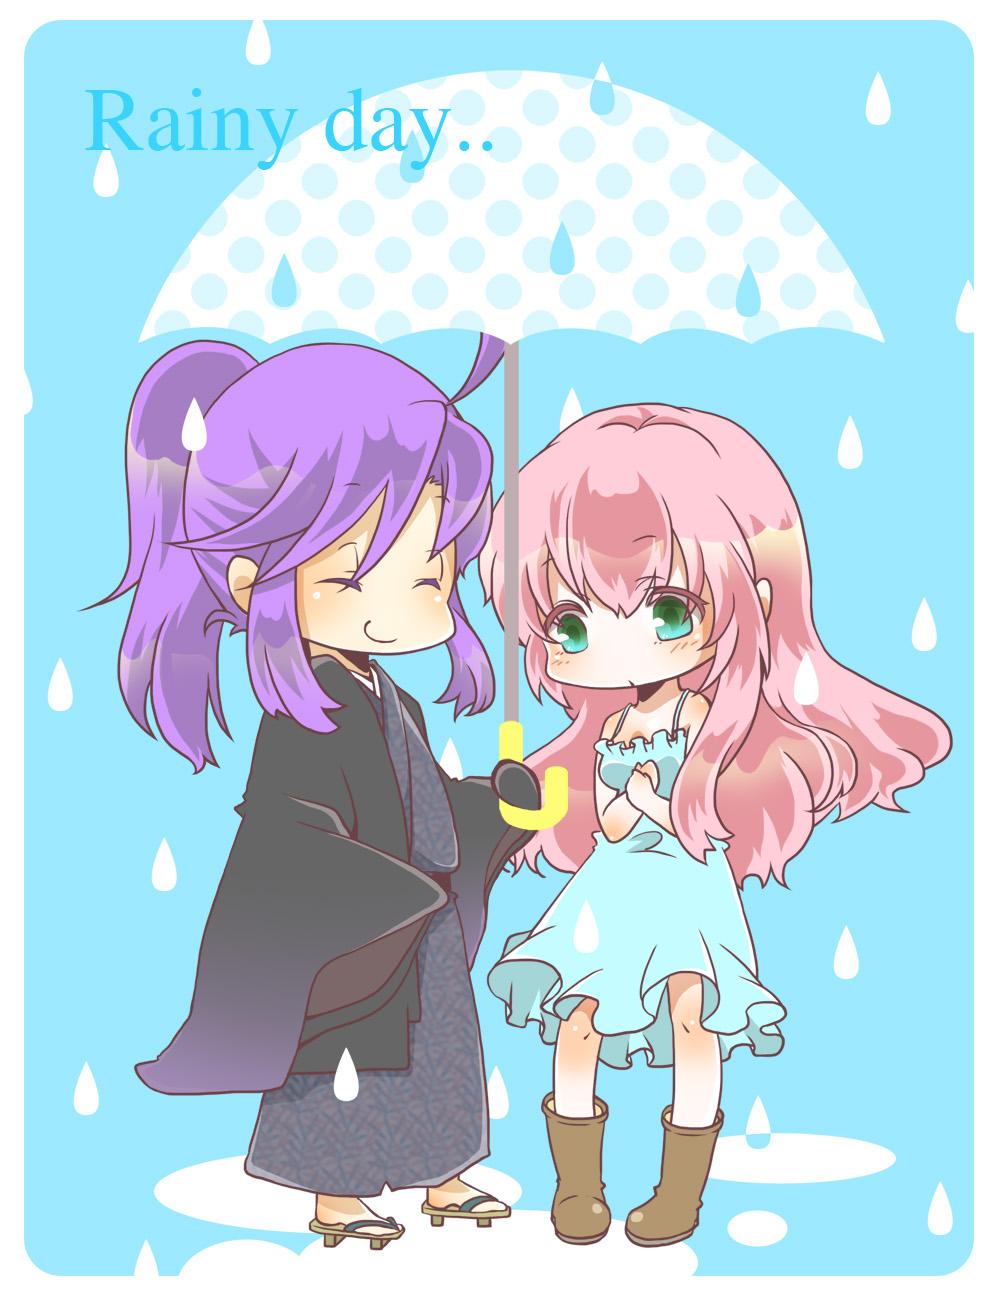 Kamui Gakupo, Chibi | page 6 - Zerochan Anime Image Board